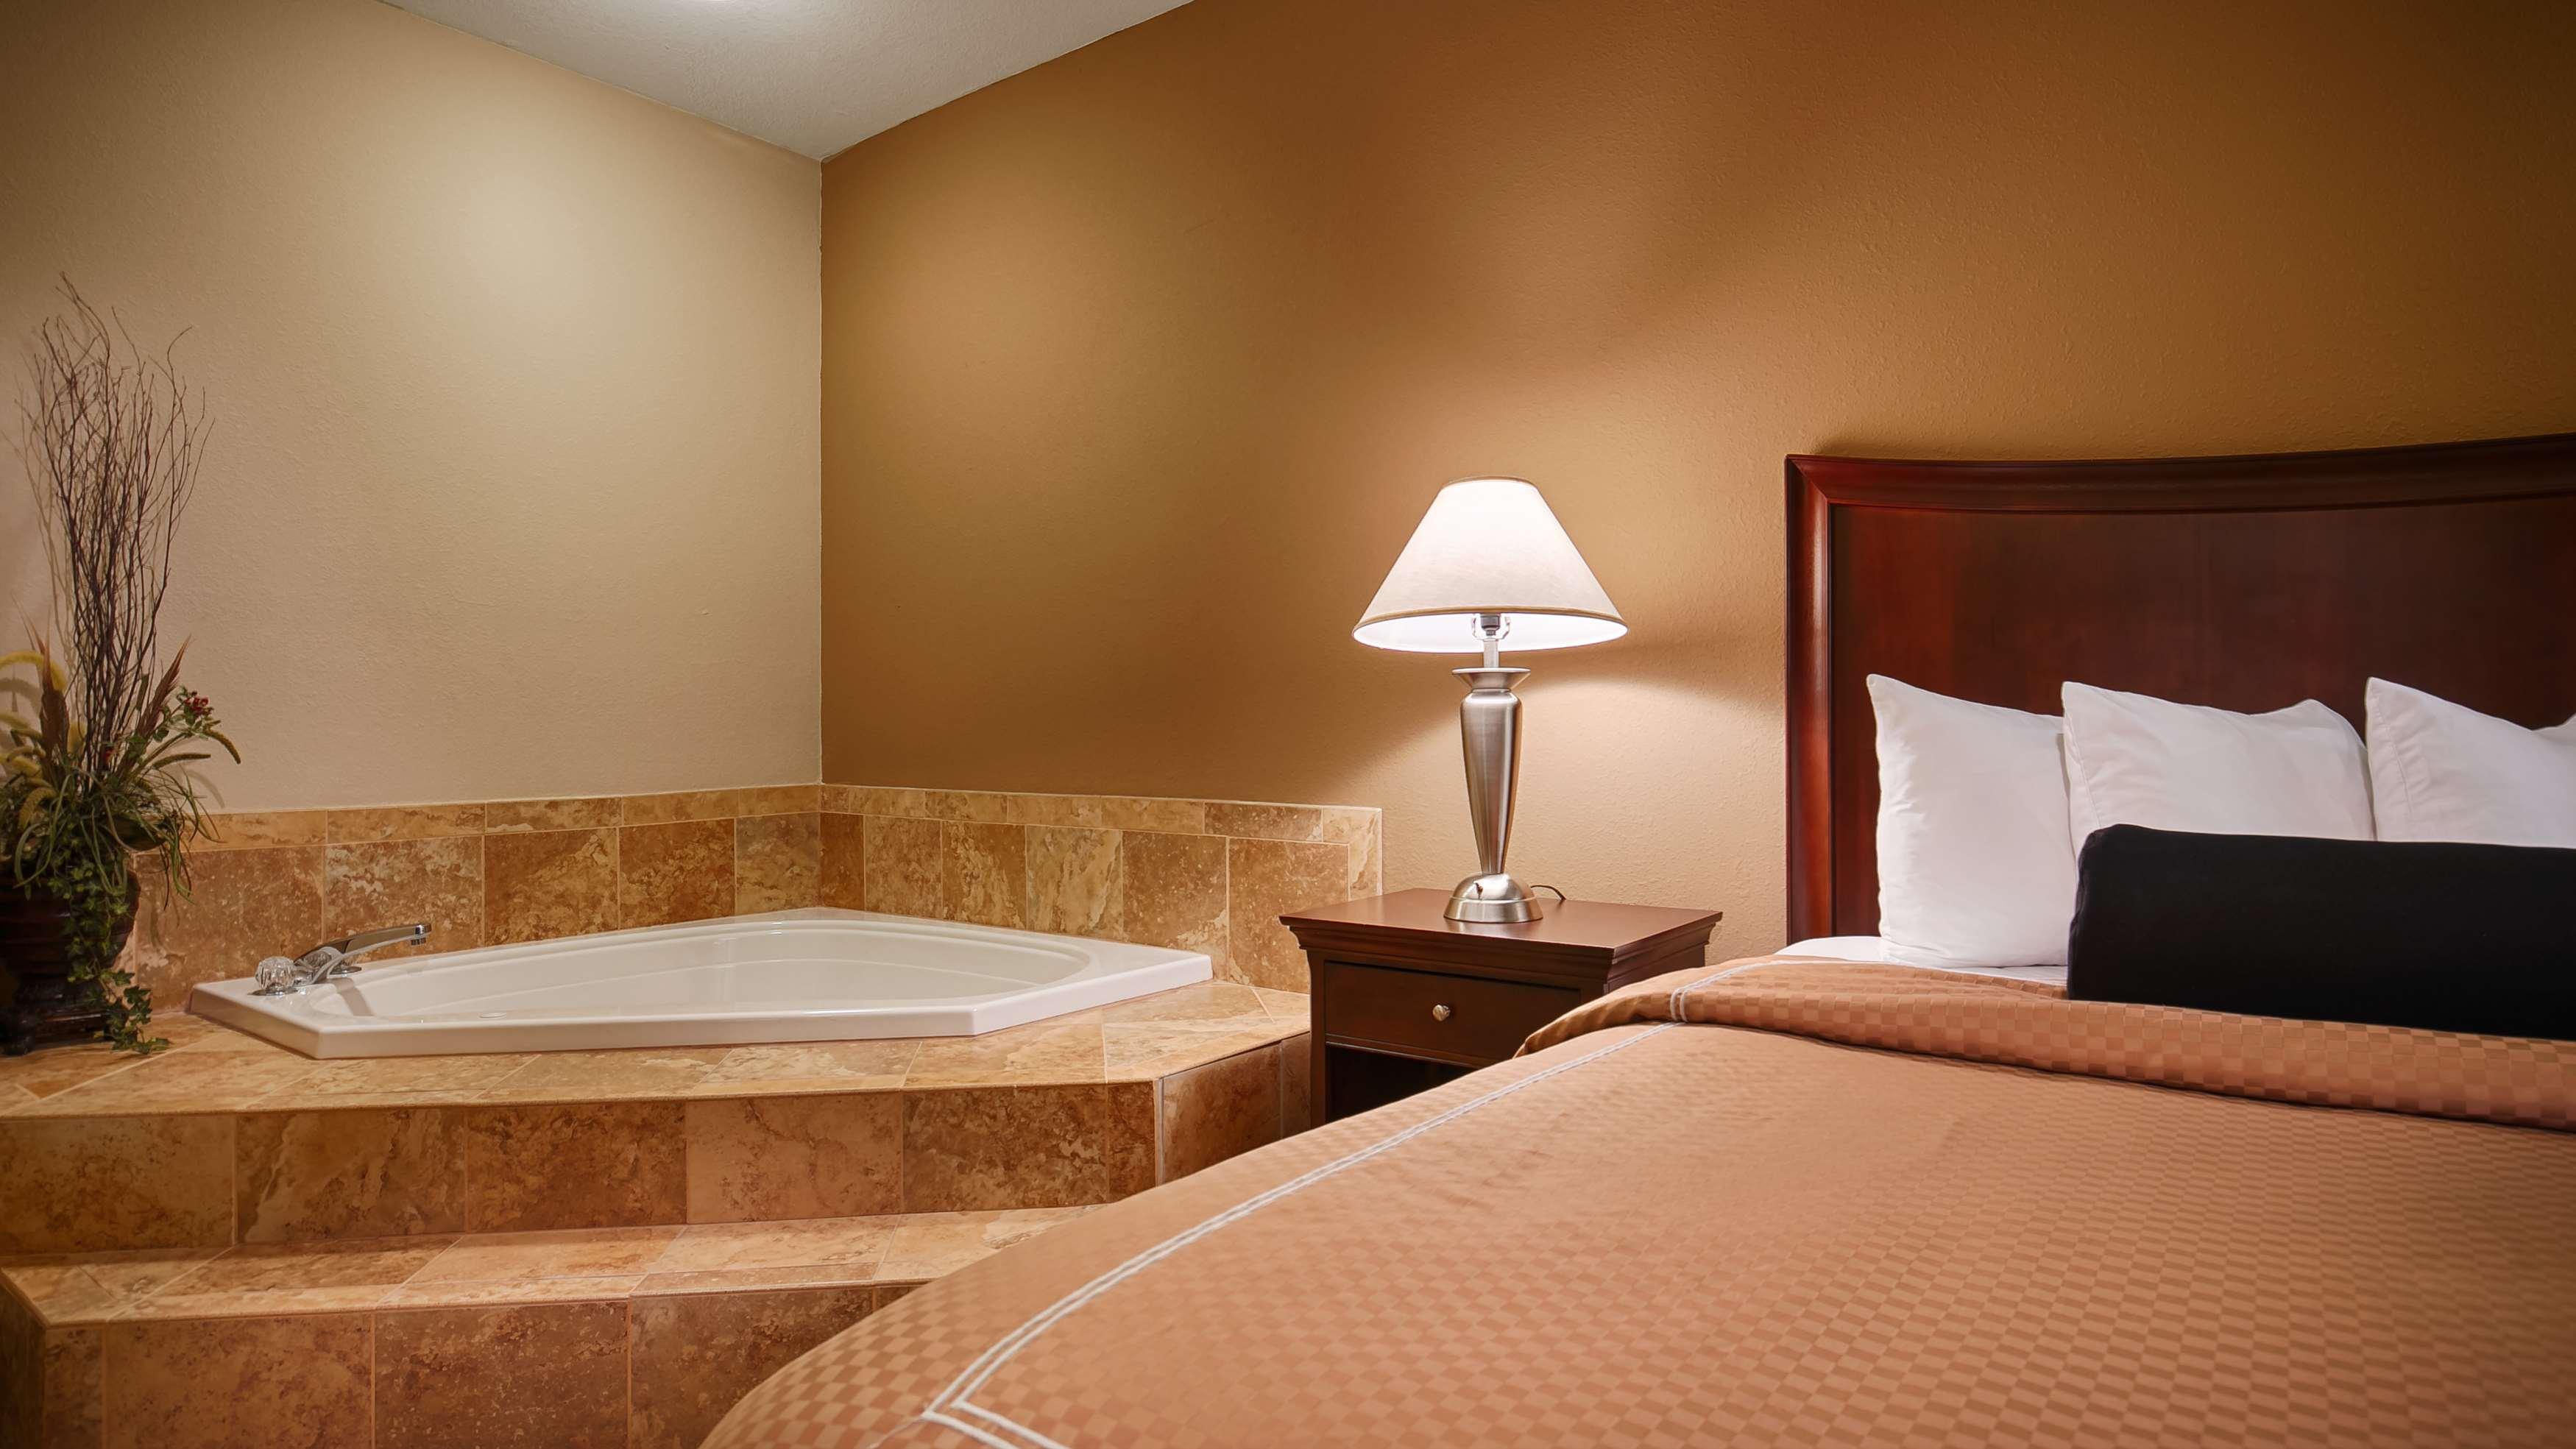 Best Western Plus Daphne Inn & Suites image 9